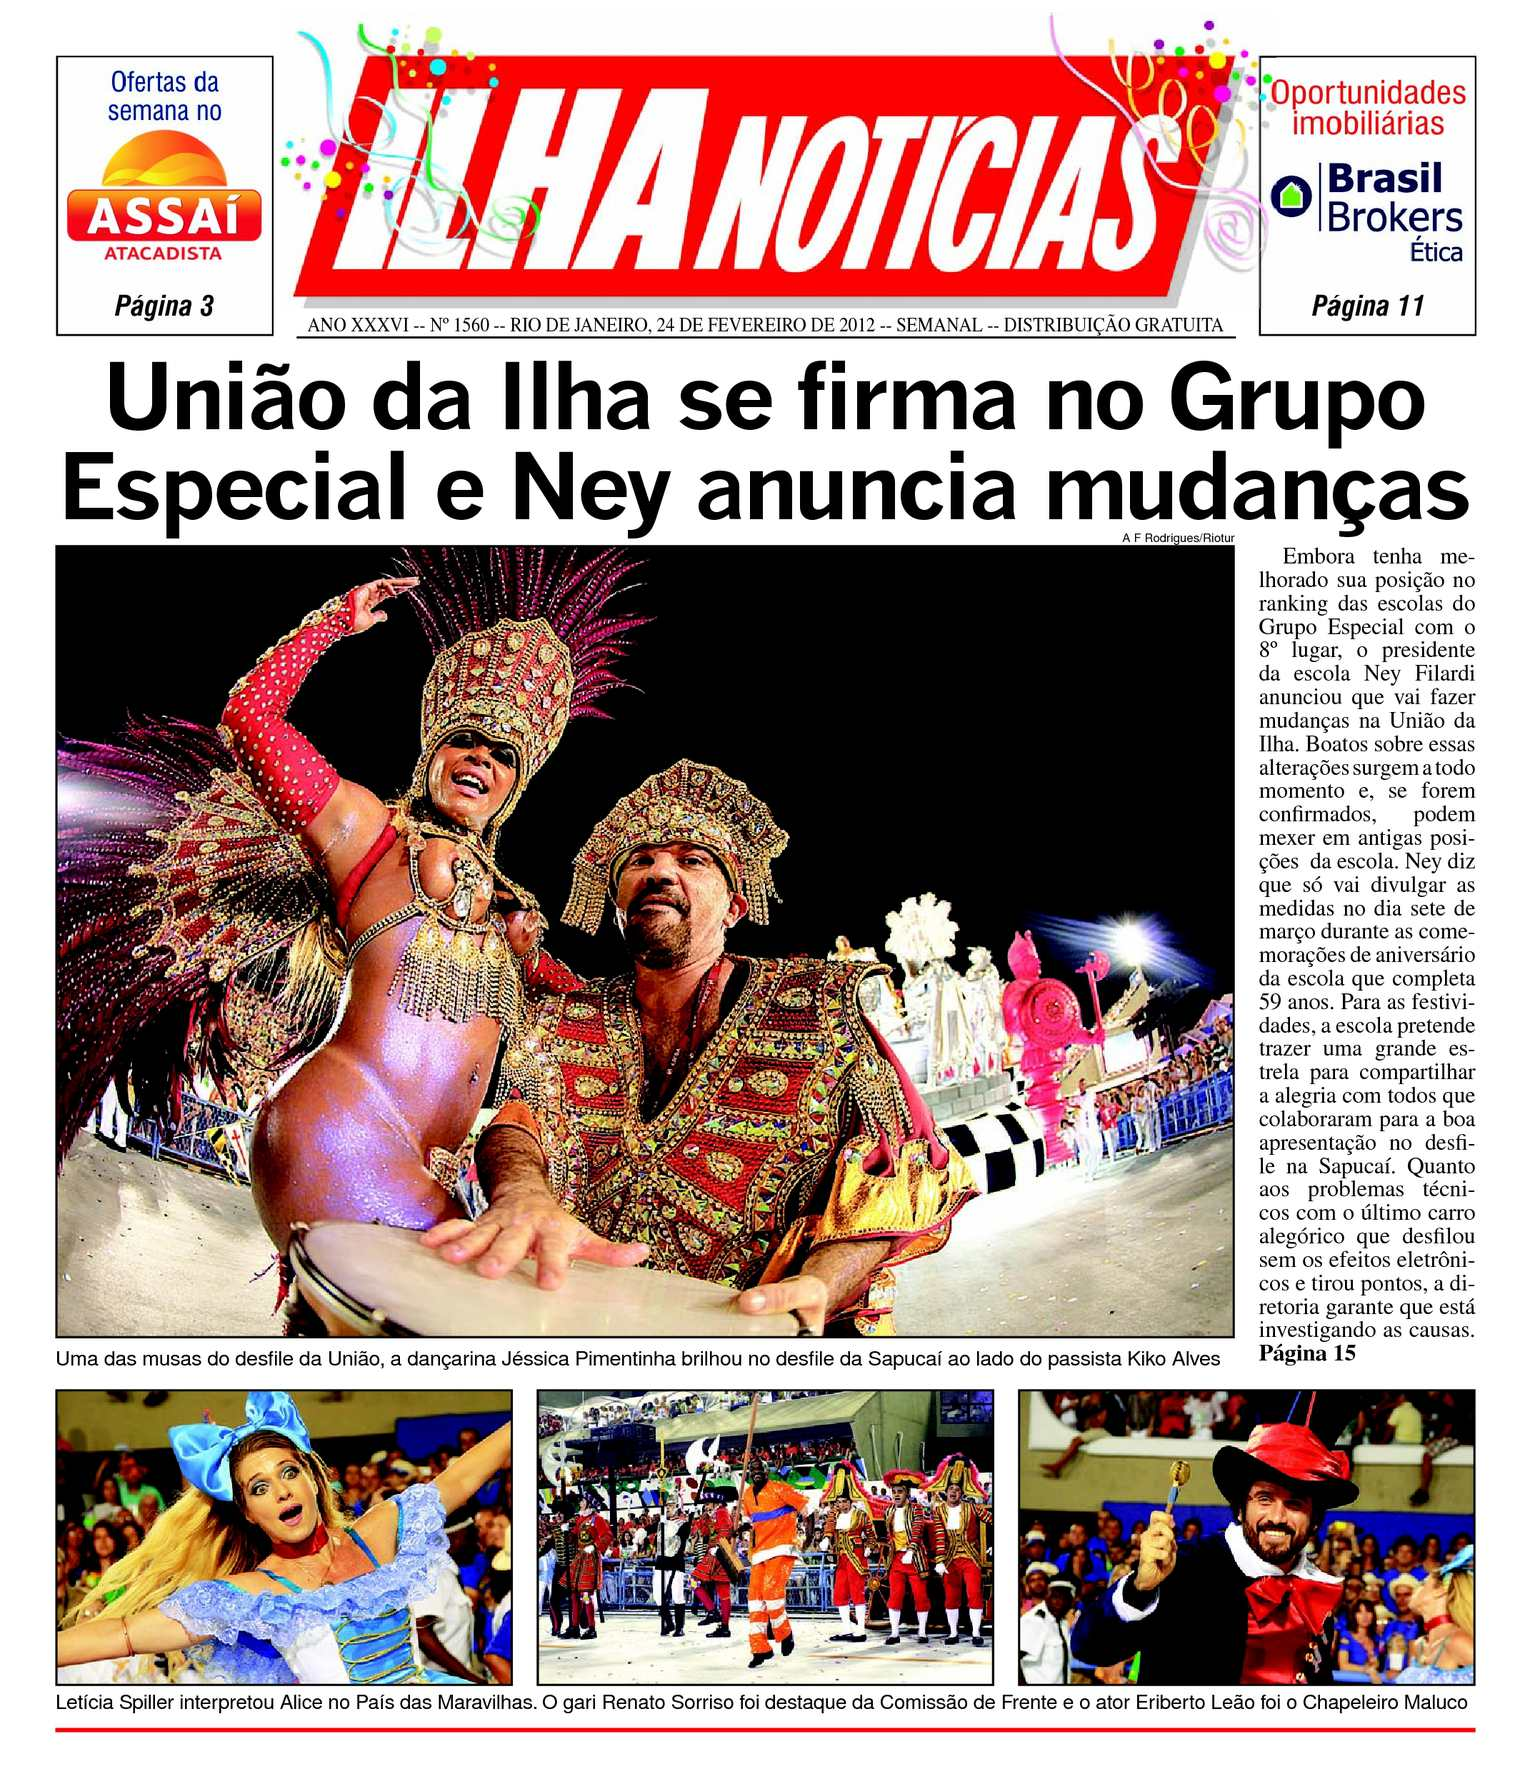 Calaméo - Jornal Ilha Notícias - Edição 1560 - 24 02 2012 861003b29c